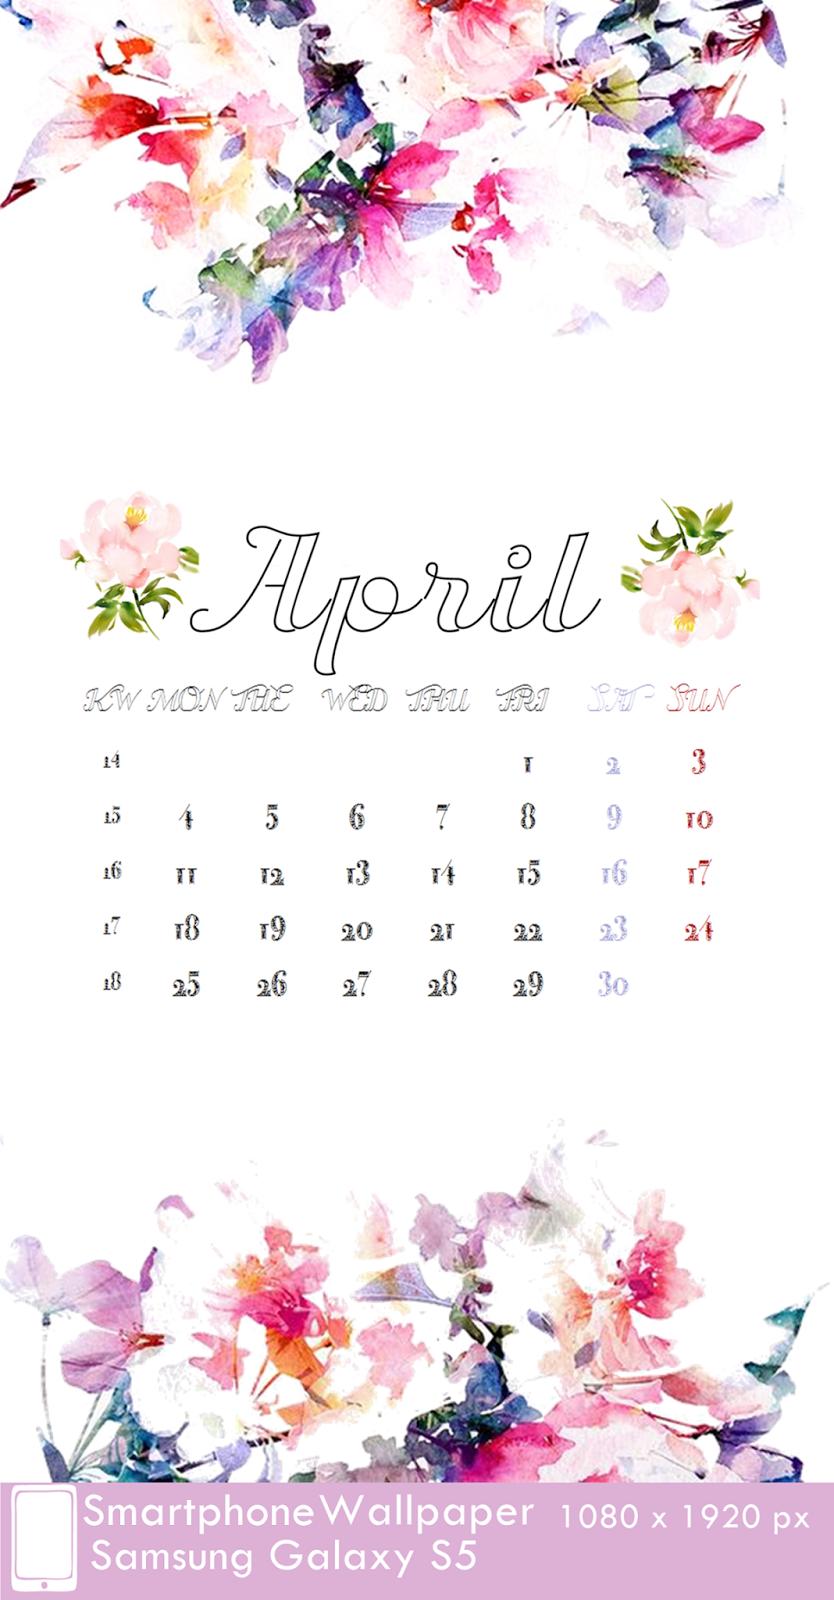 Samsung Galaxy S5 Wallpaper Calendar April 2016 fest 1080 x 1920 px